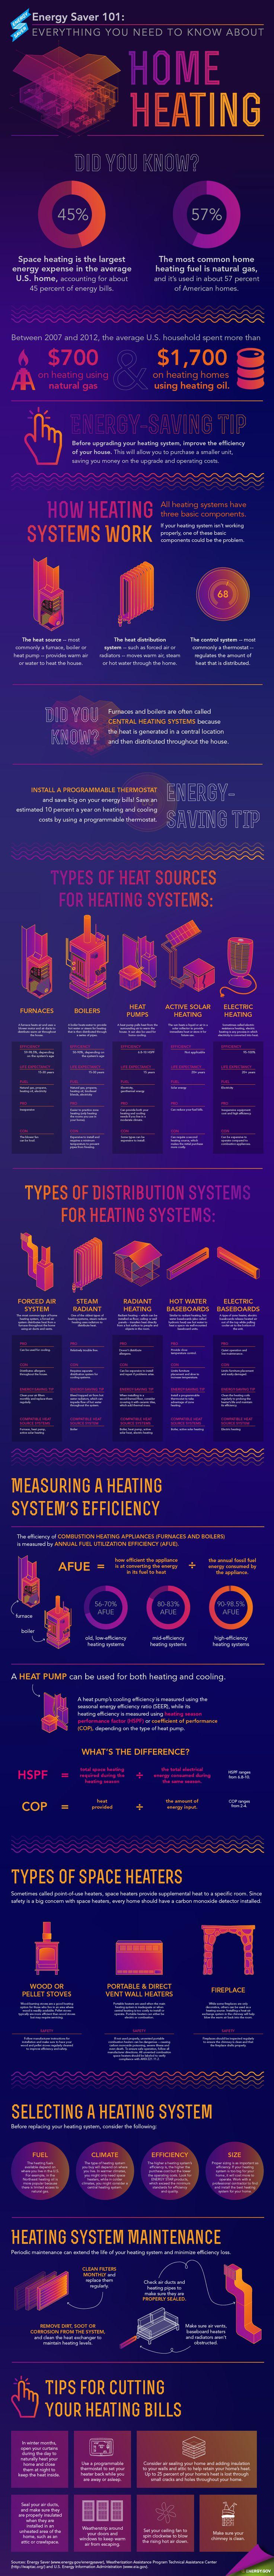 Energy Saver 101: Home Heating #Infographics — Lightscap3s.com